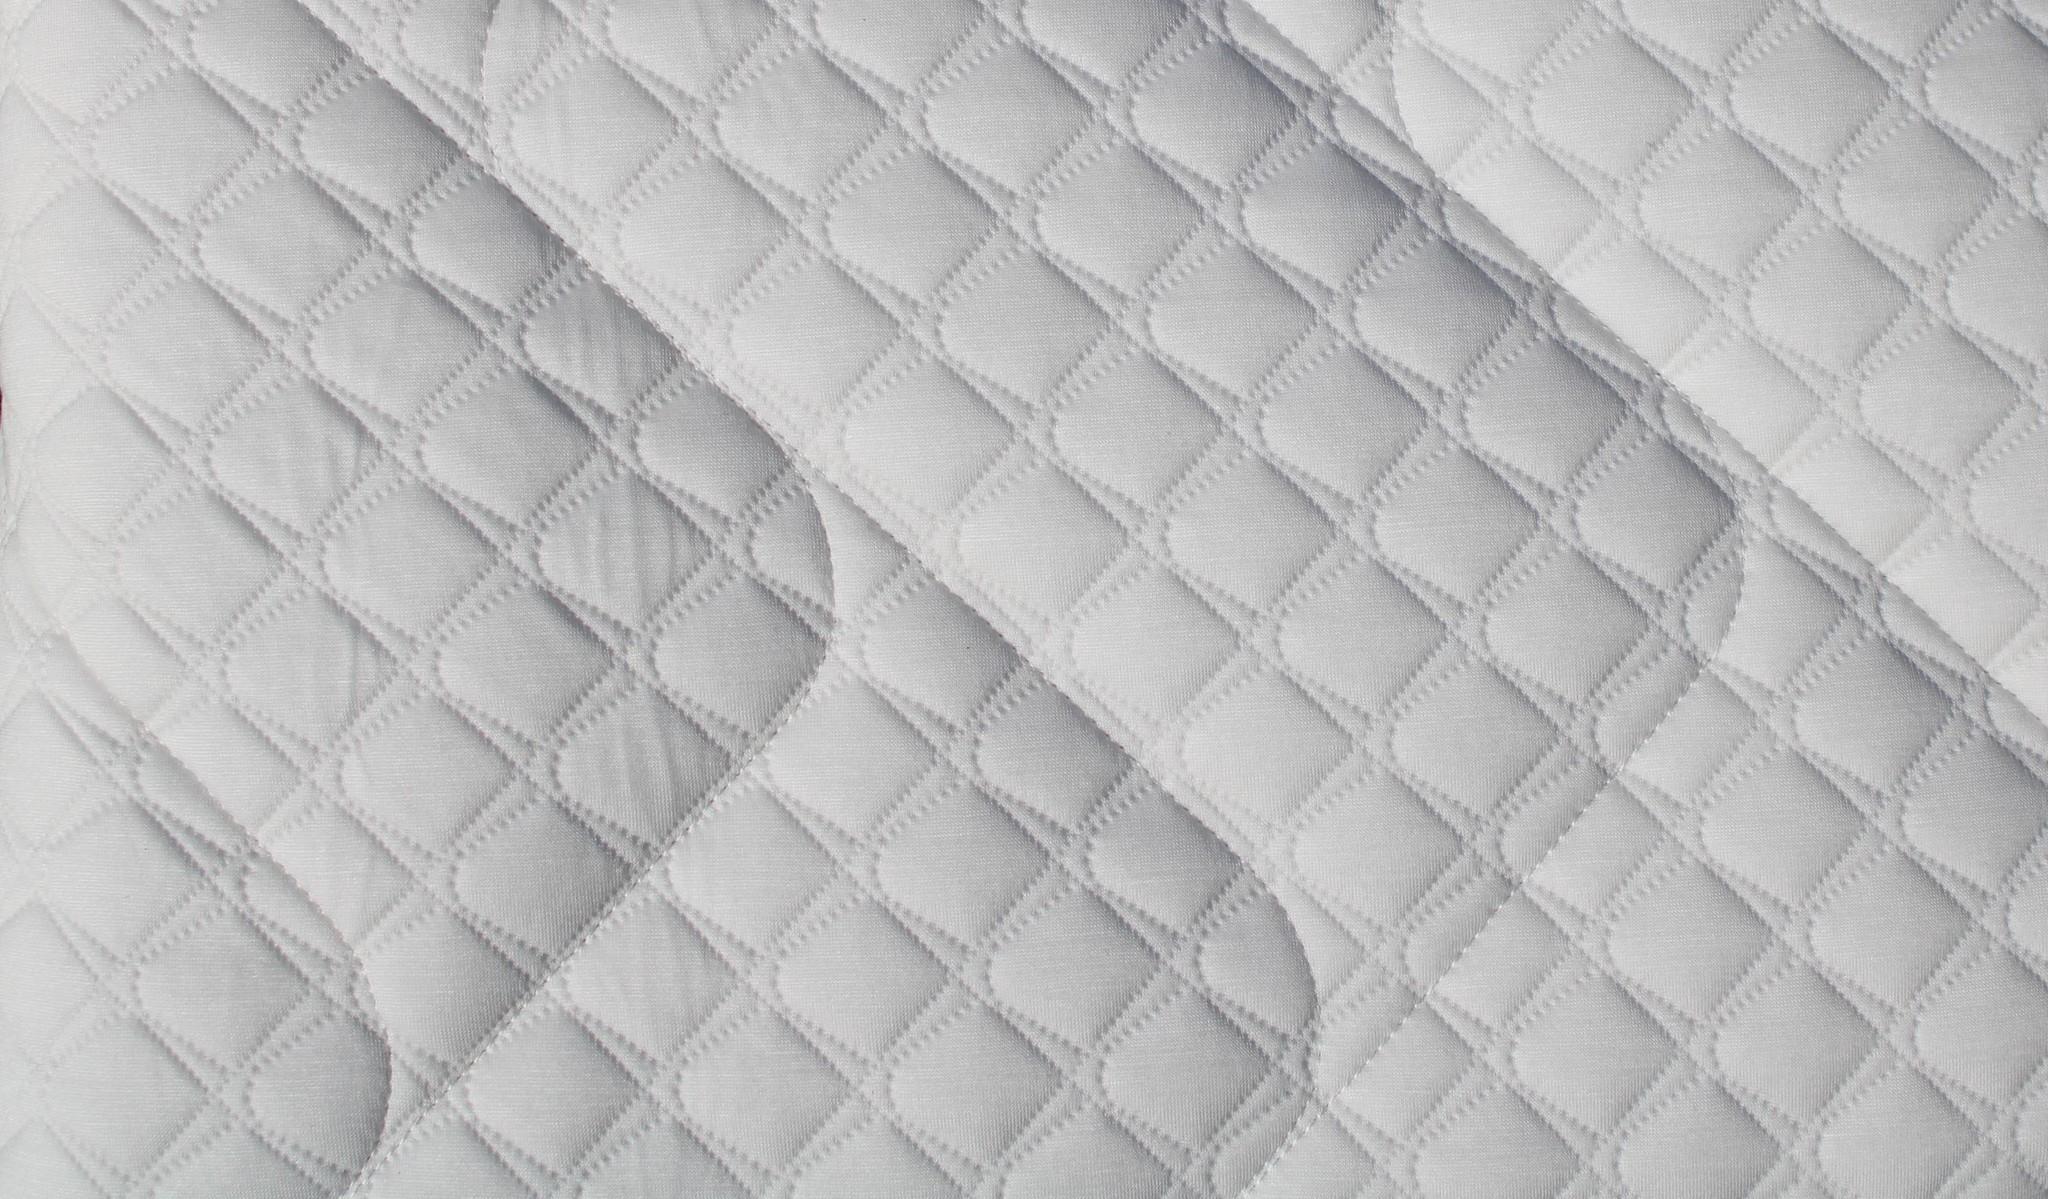 Sarpy Kindermatras 90x175 Sertel Tailor Made Mattress